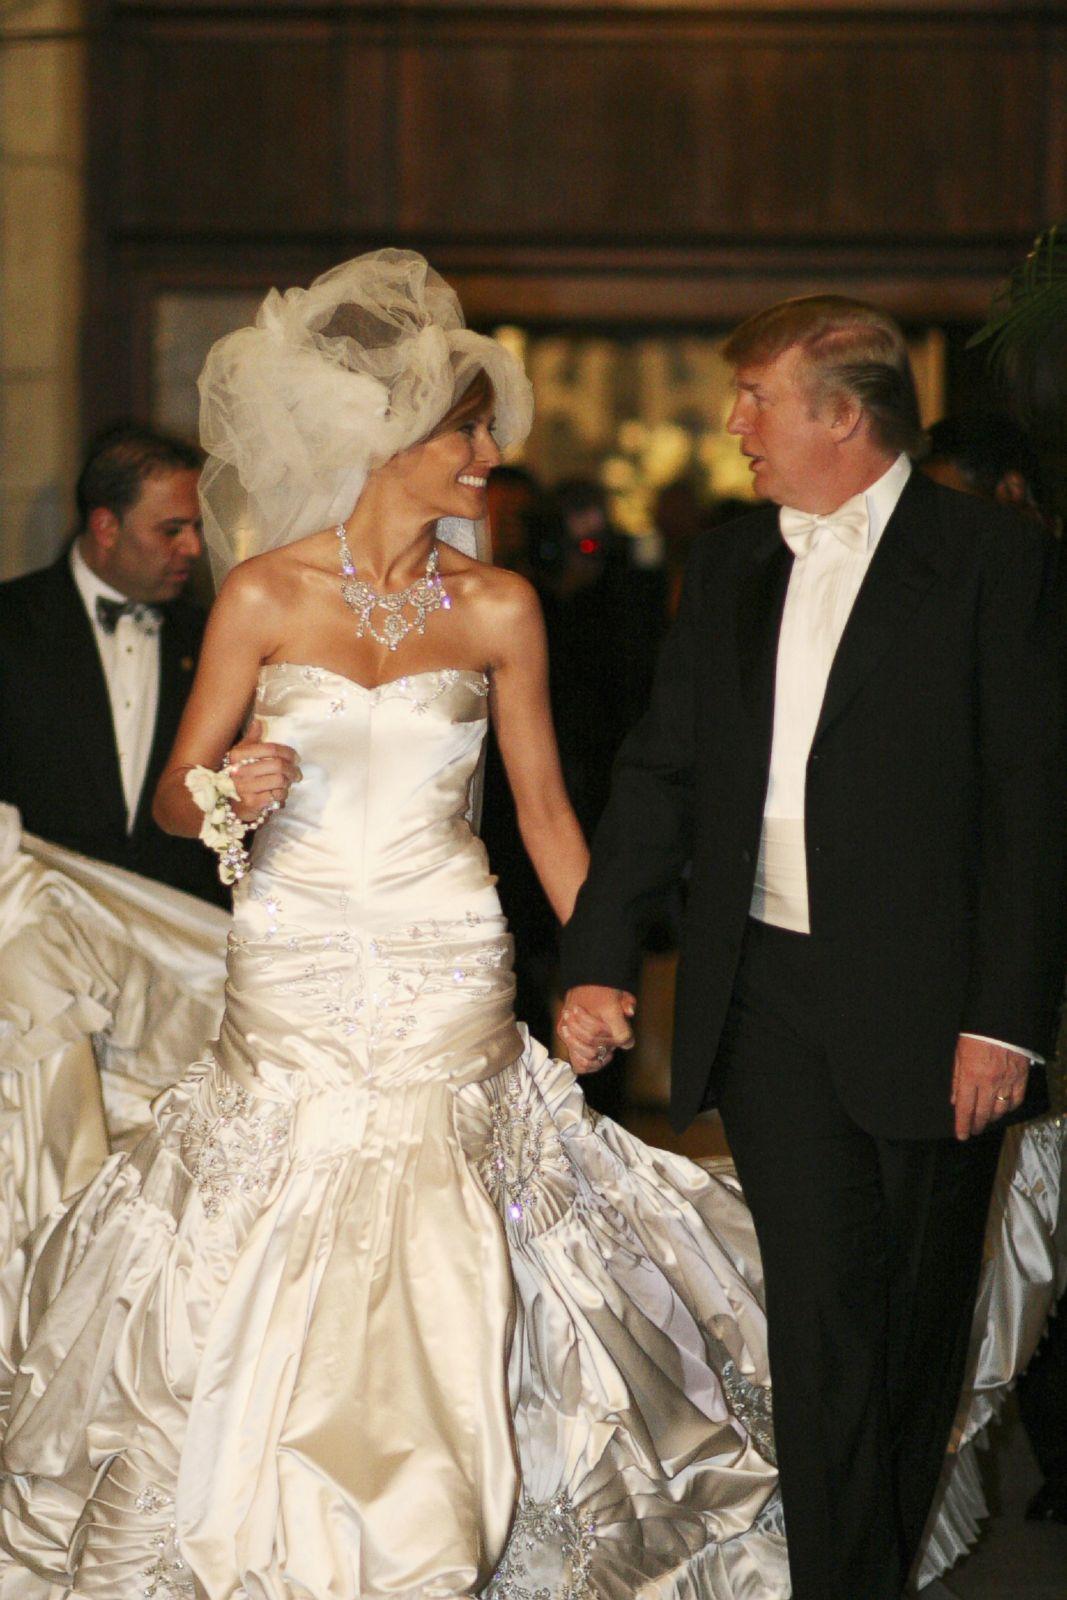 GTY-melania-donald-trump-wedding-170118_2x3_1600.jpg